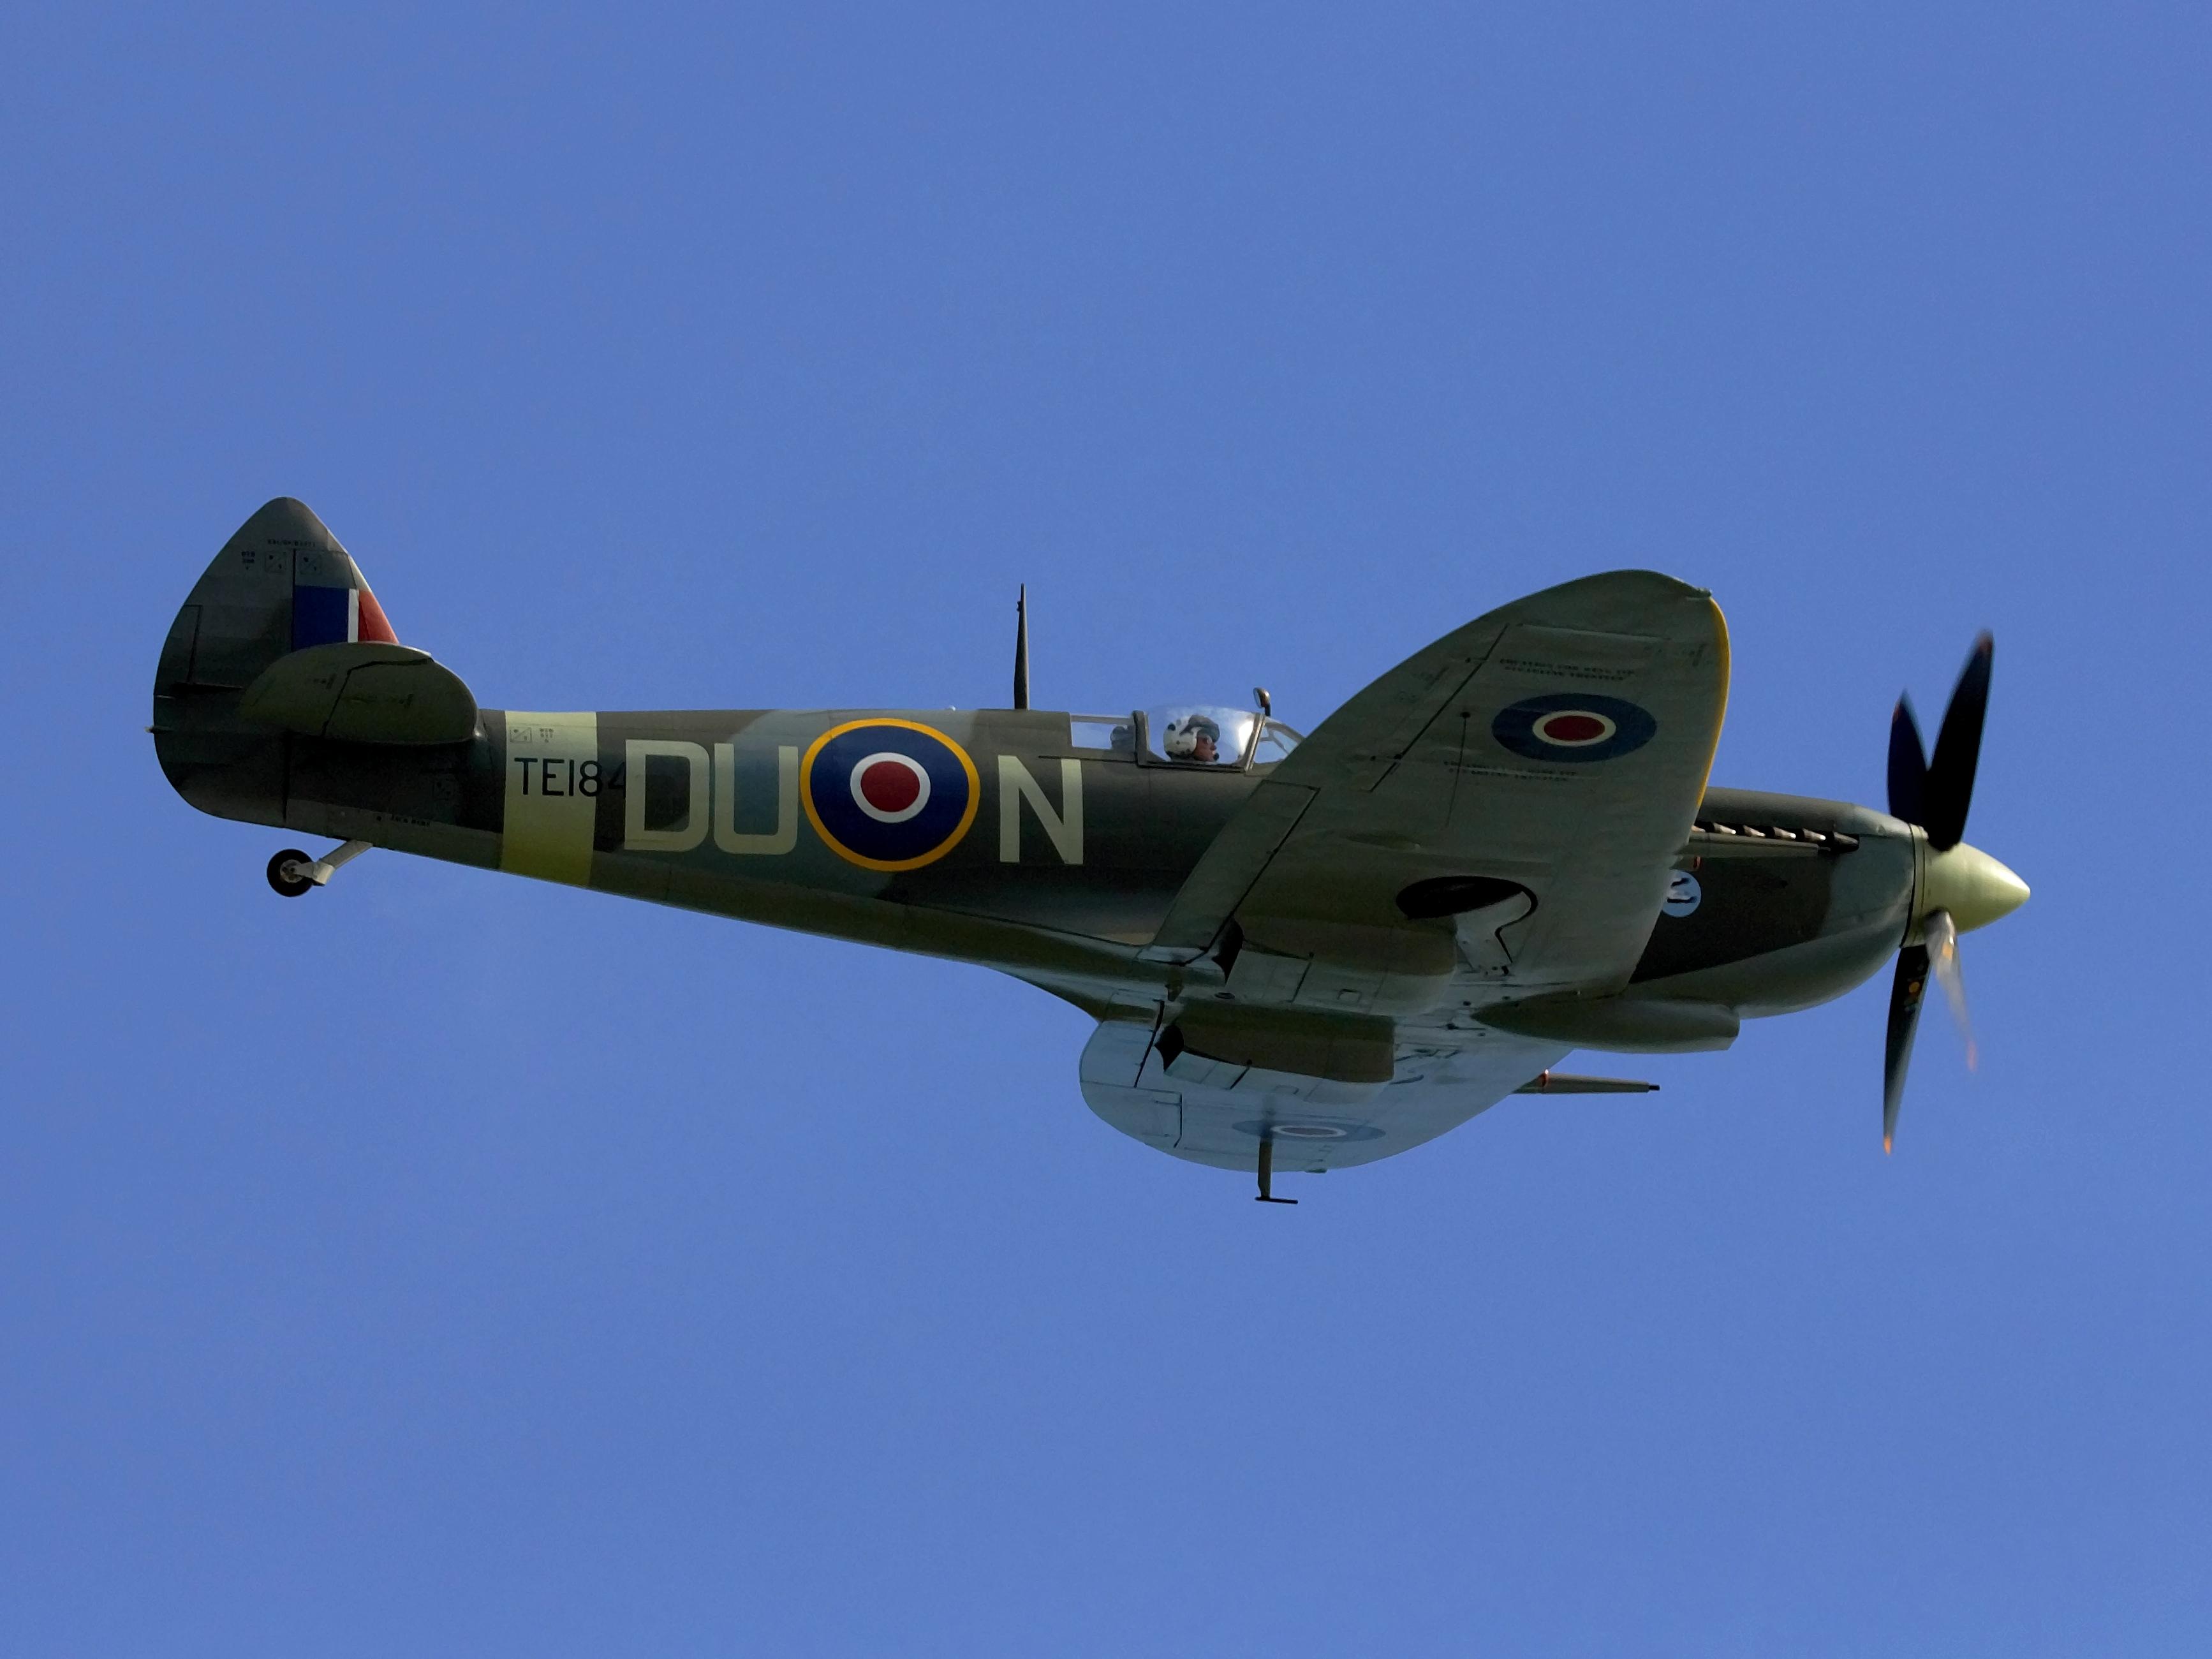 Spitfire Mk.XVI